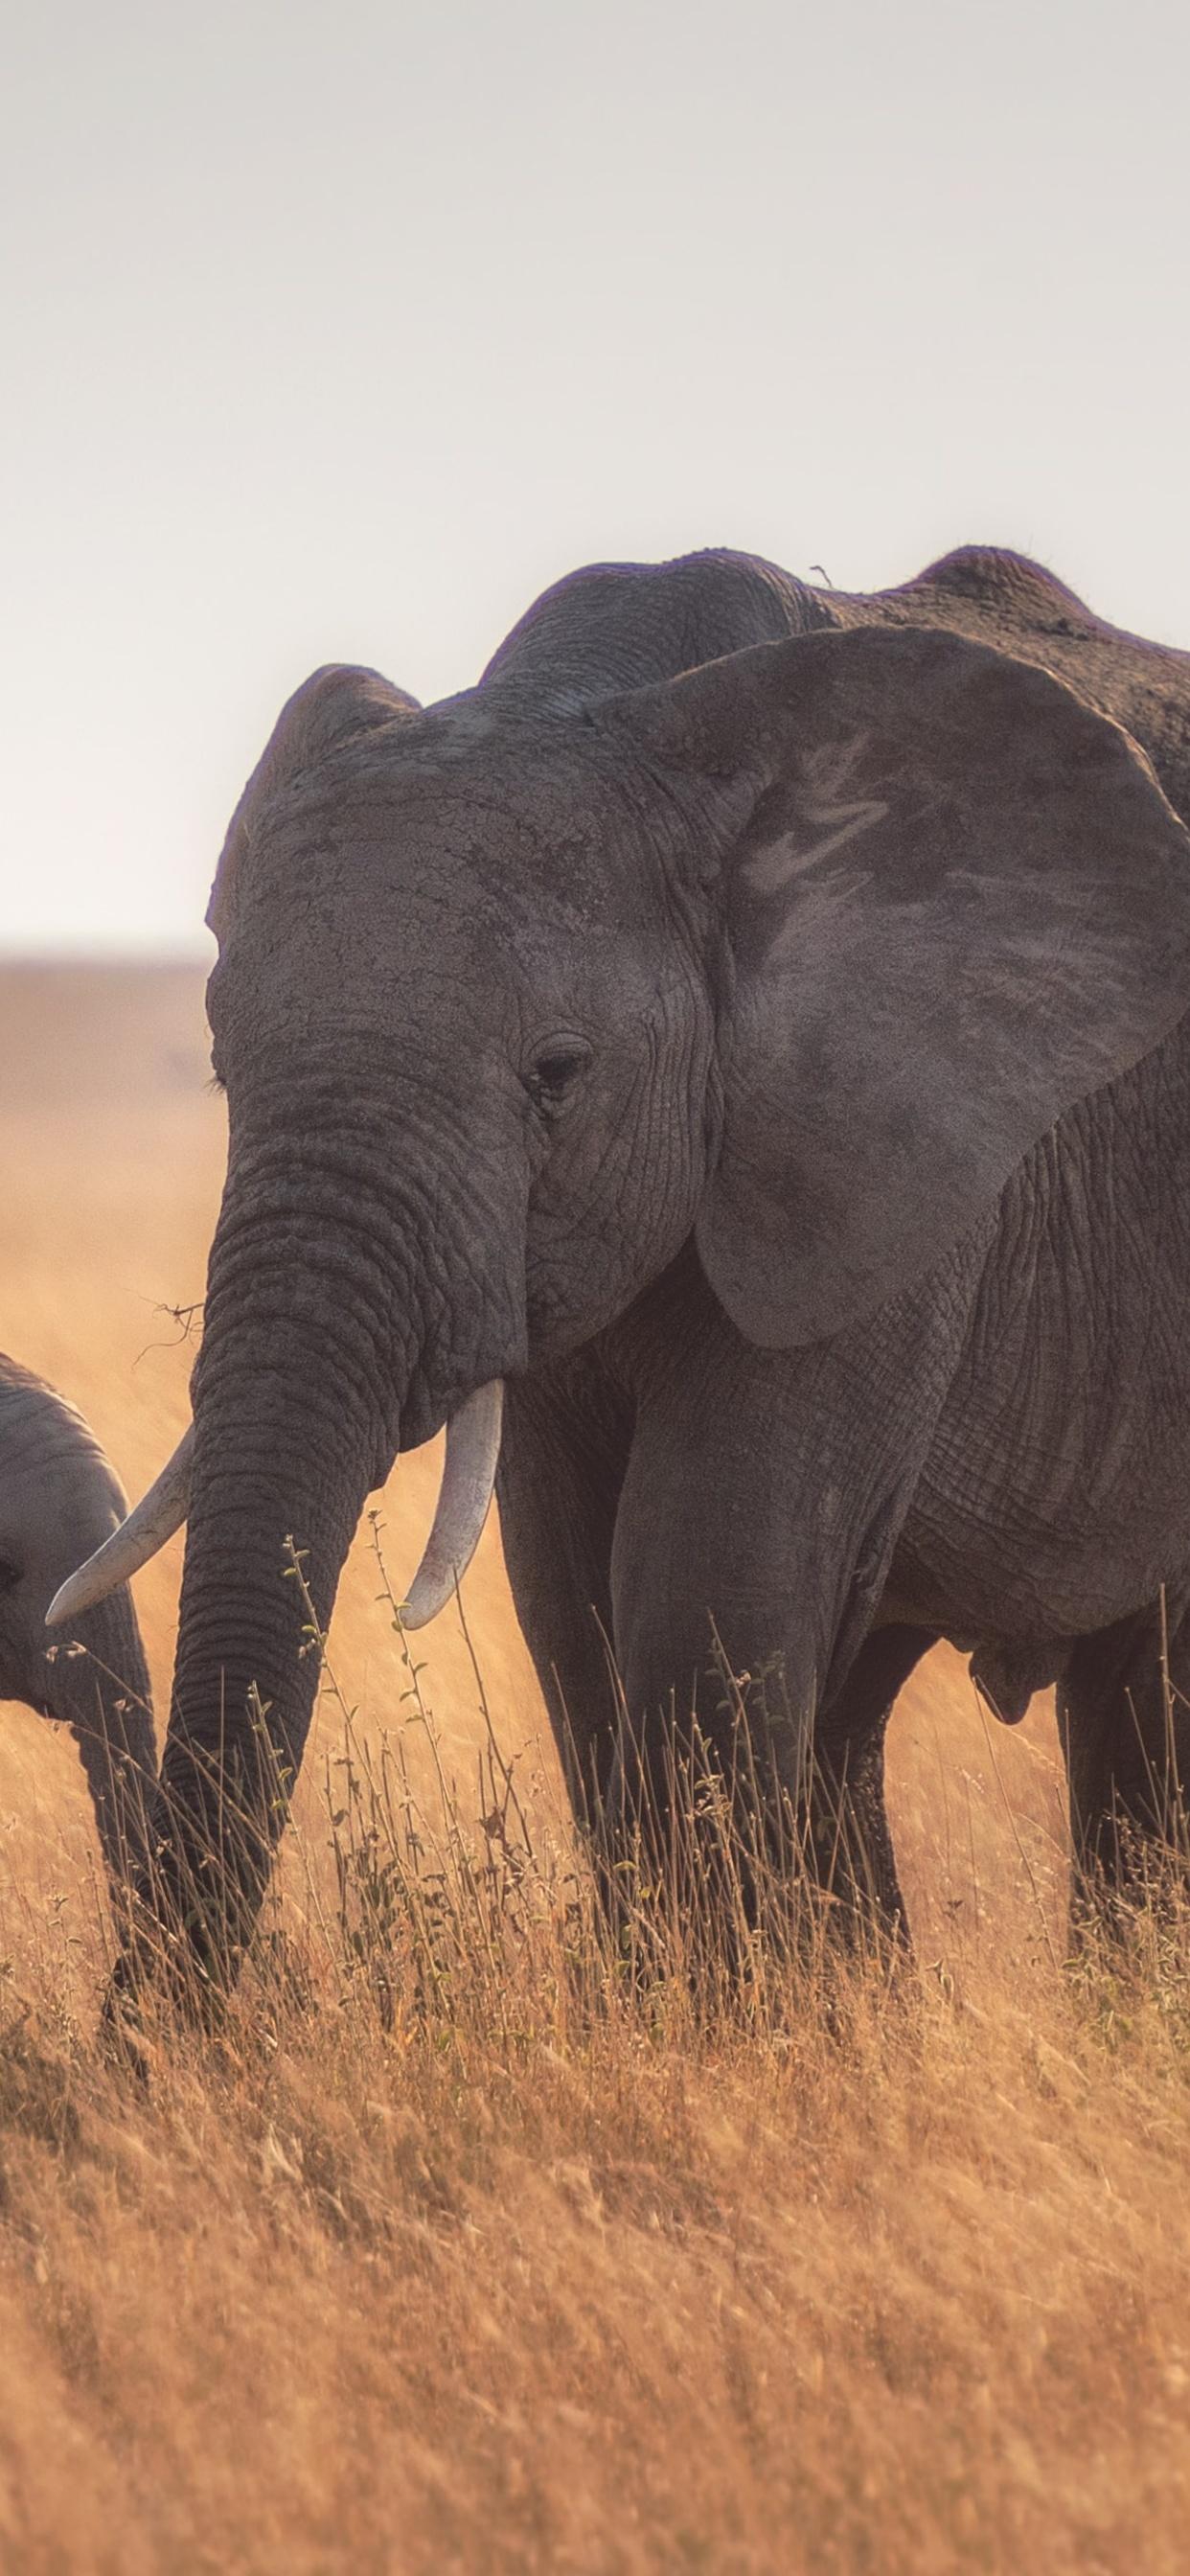 mother-baby-elephant-4k-ki.jpg